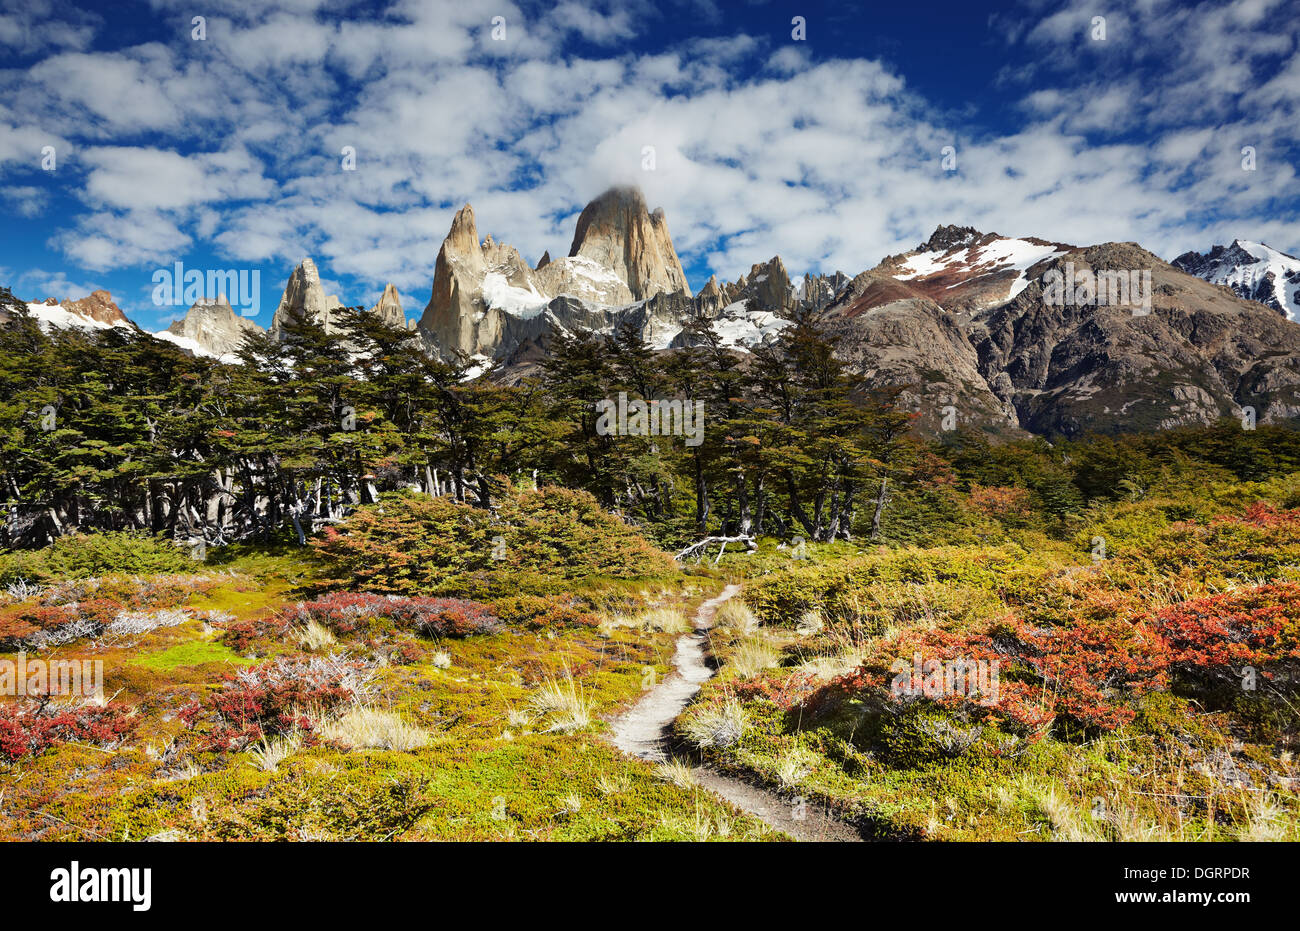 Mount Fitz Roy, Los Glaciares National Park, Patagonia, Argentina - Stock Image